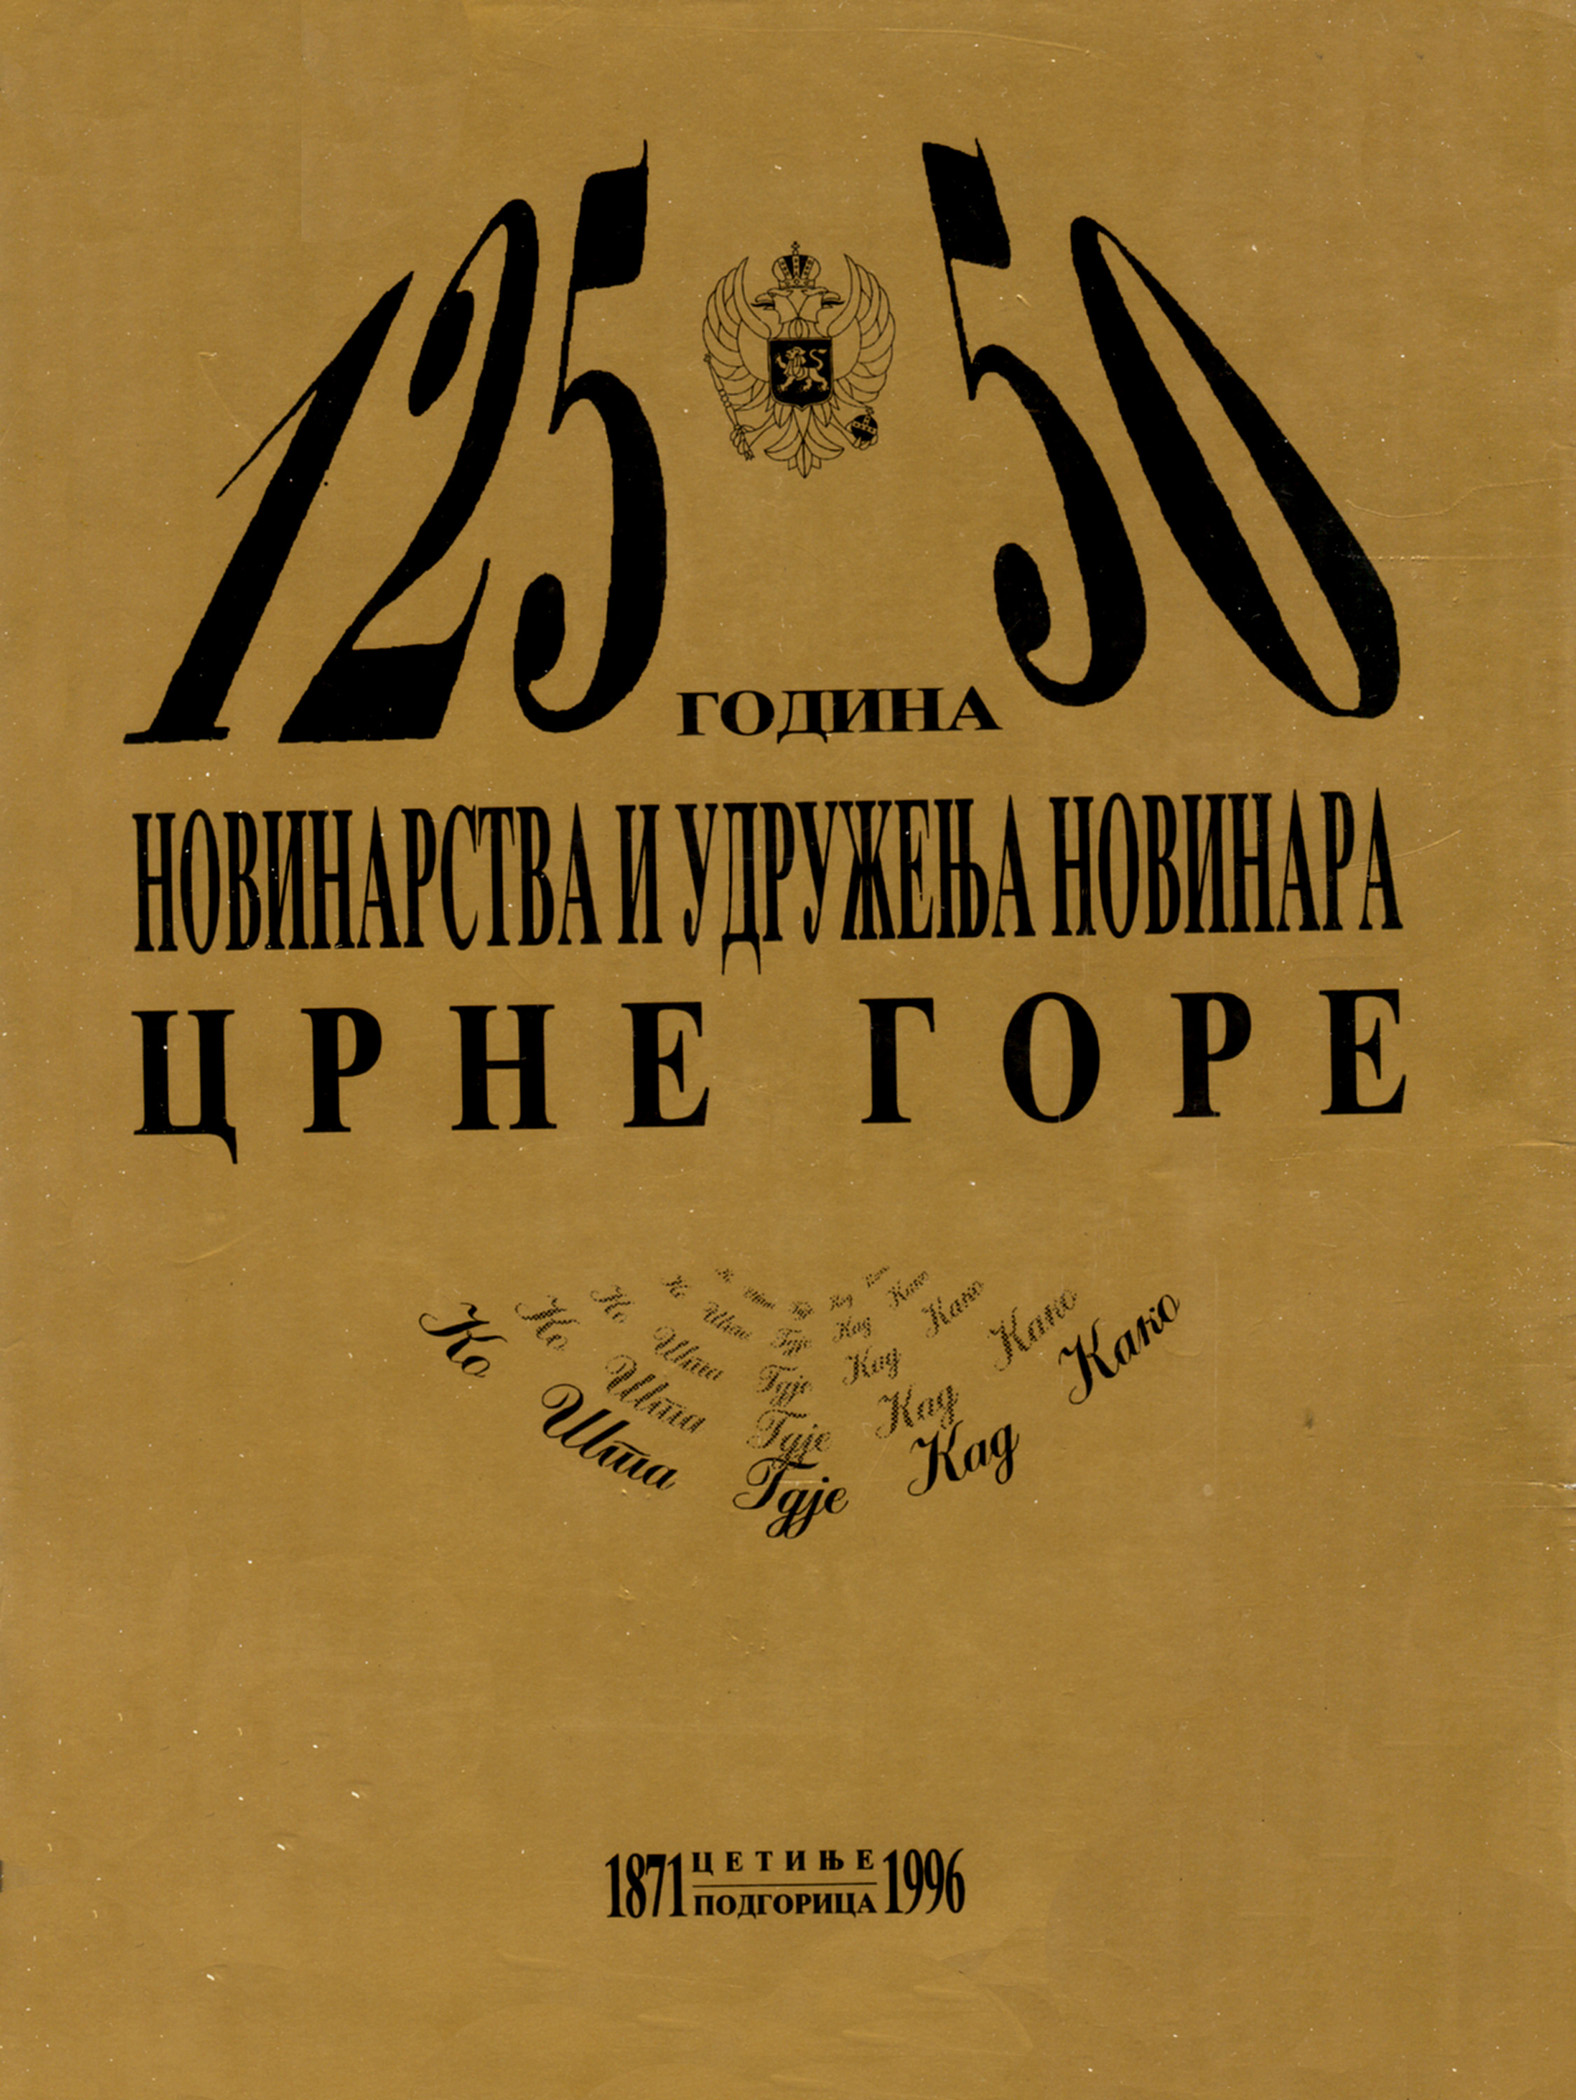 Naslovna strana knjige o novinarstvu